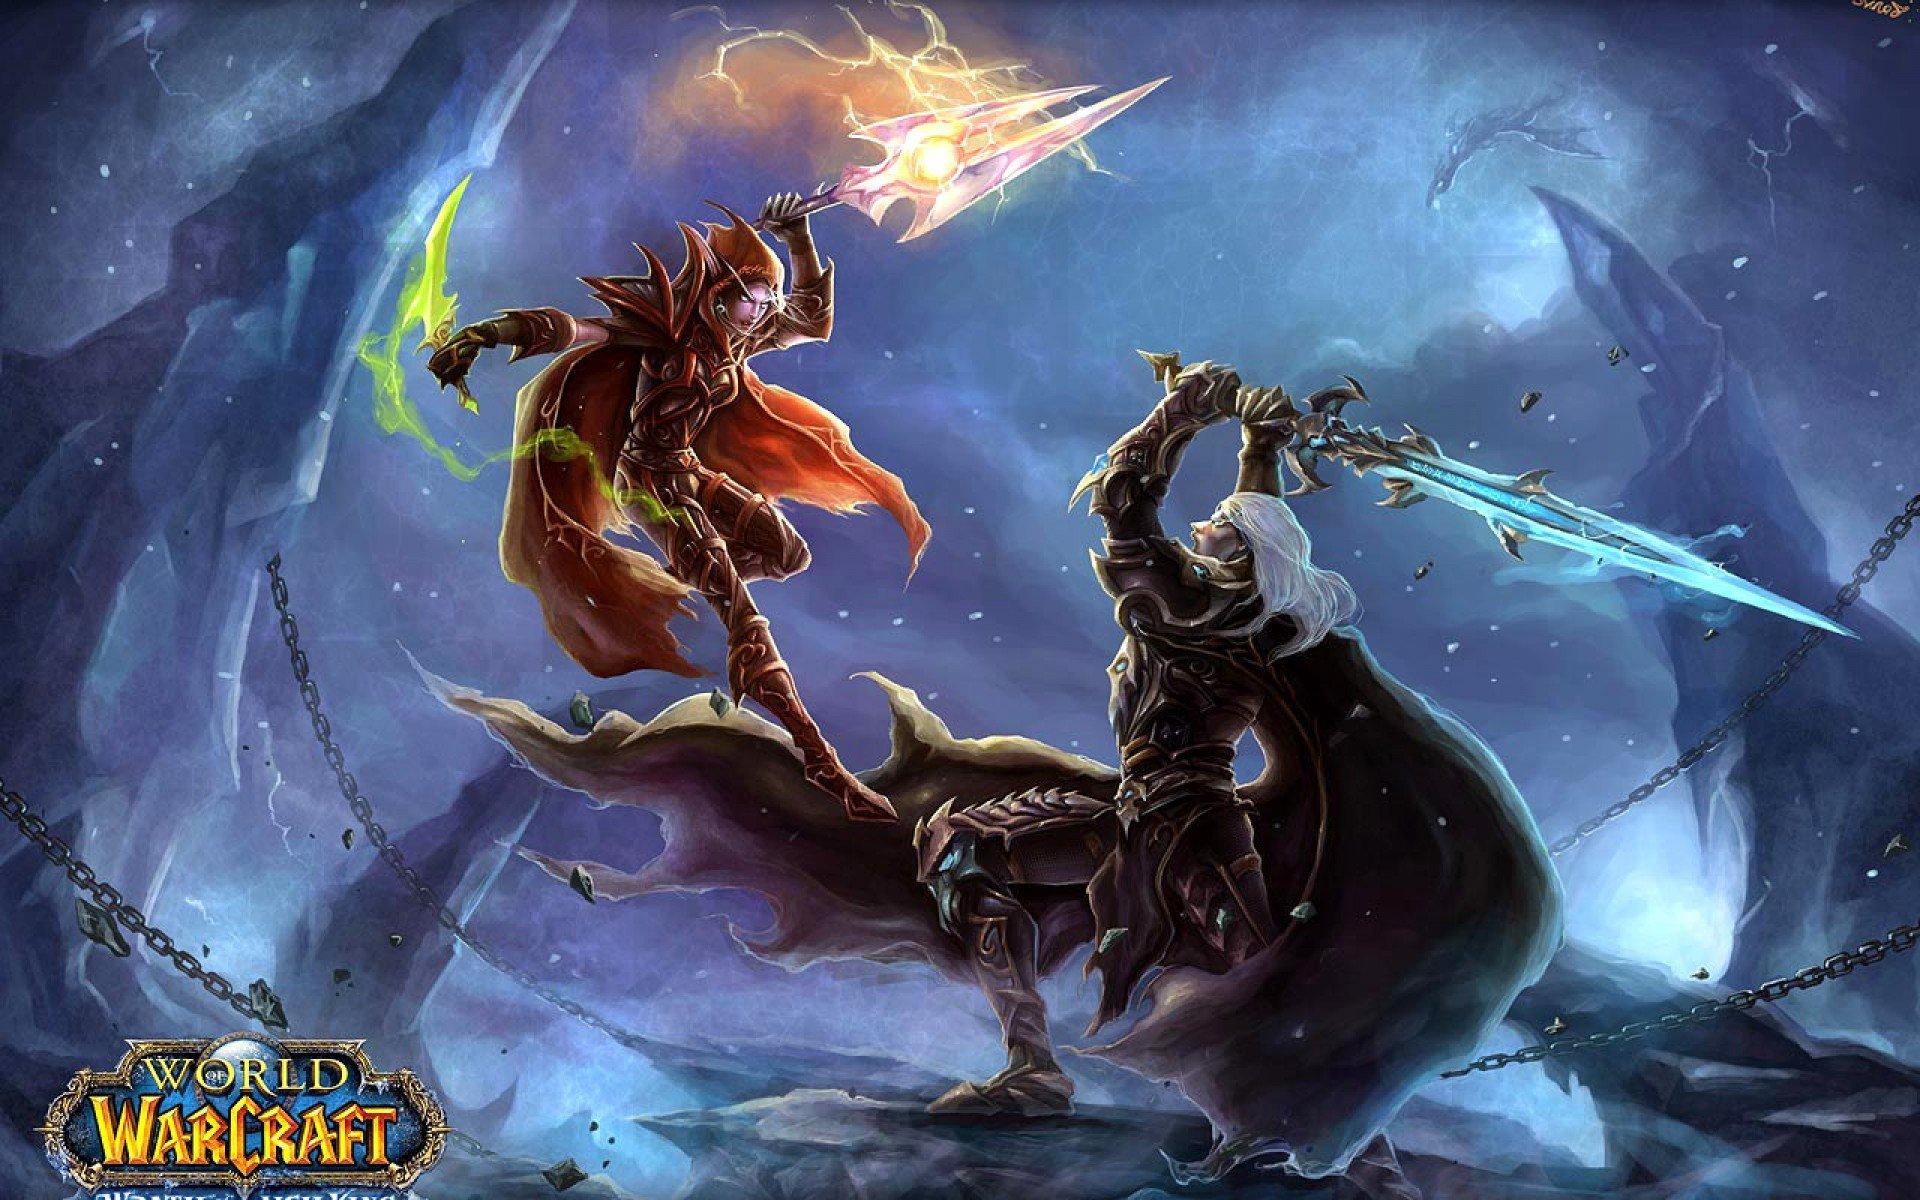 World Of Warcraft Backgrounds Pixelstalk World Of Warcraft Hd